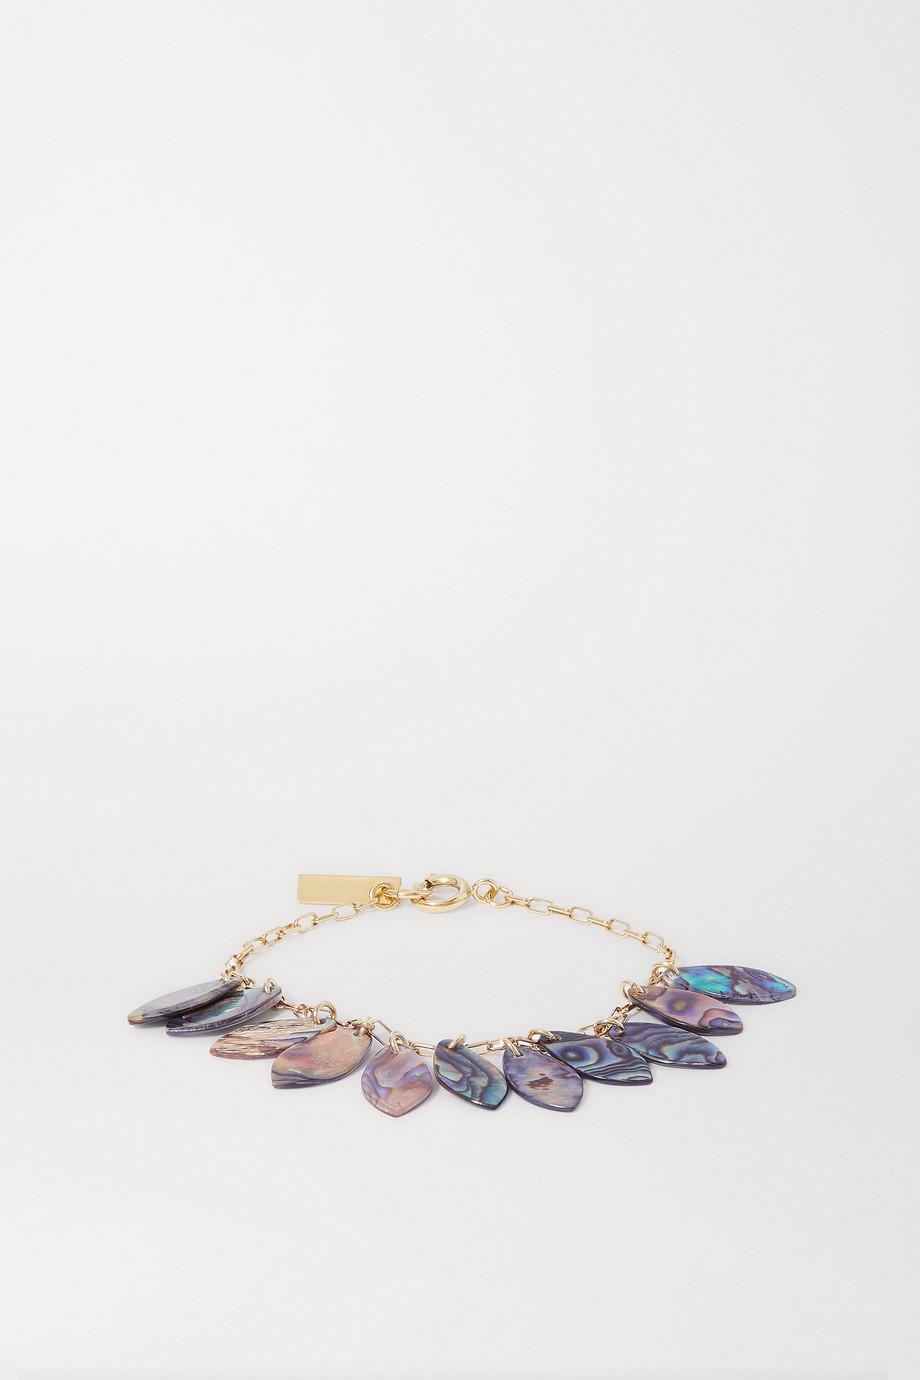 Isabel Marant Ali goldfarbenes Armband mit Muscheln